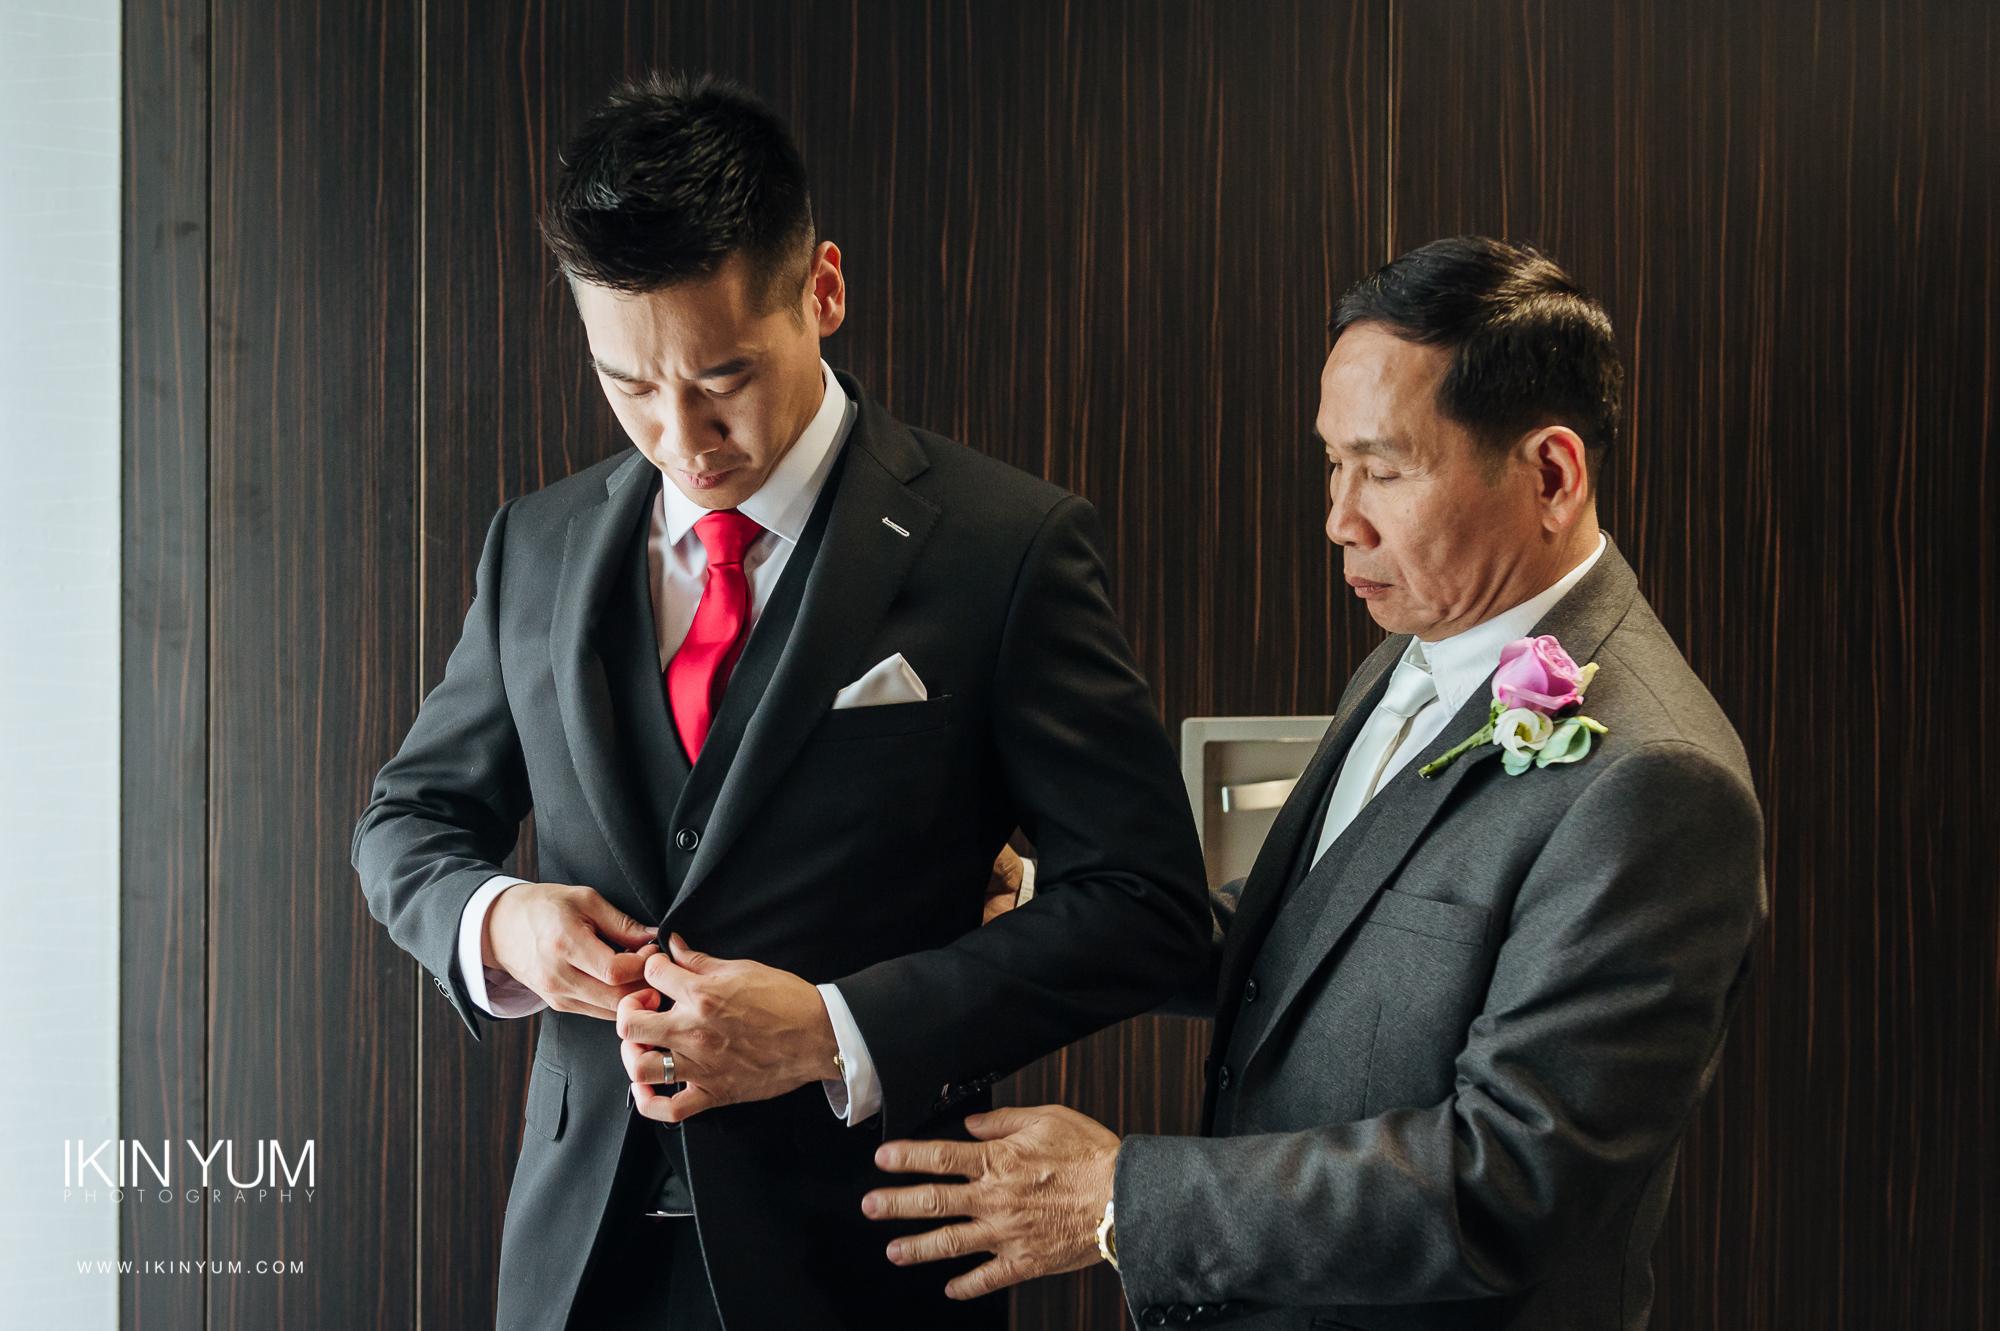 Syon Park Wedding - Ikin Yum Photography -106.jpg